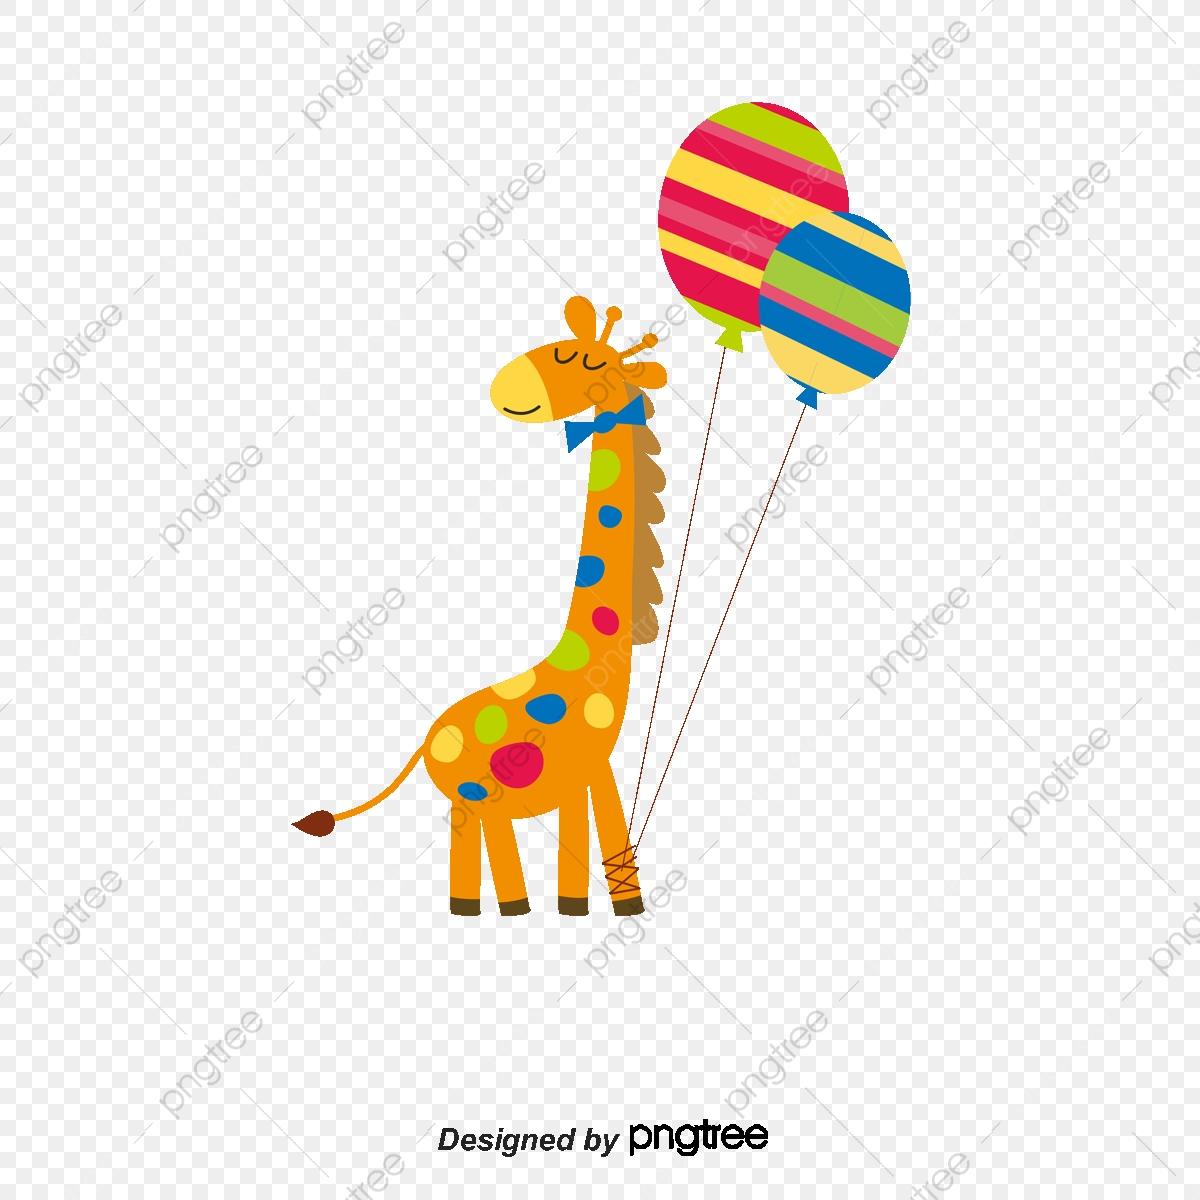 Giraffe clipart vector. Cartoon animal png and